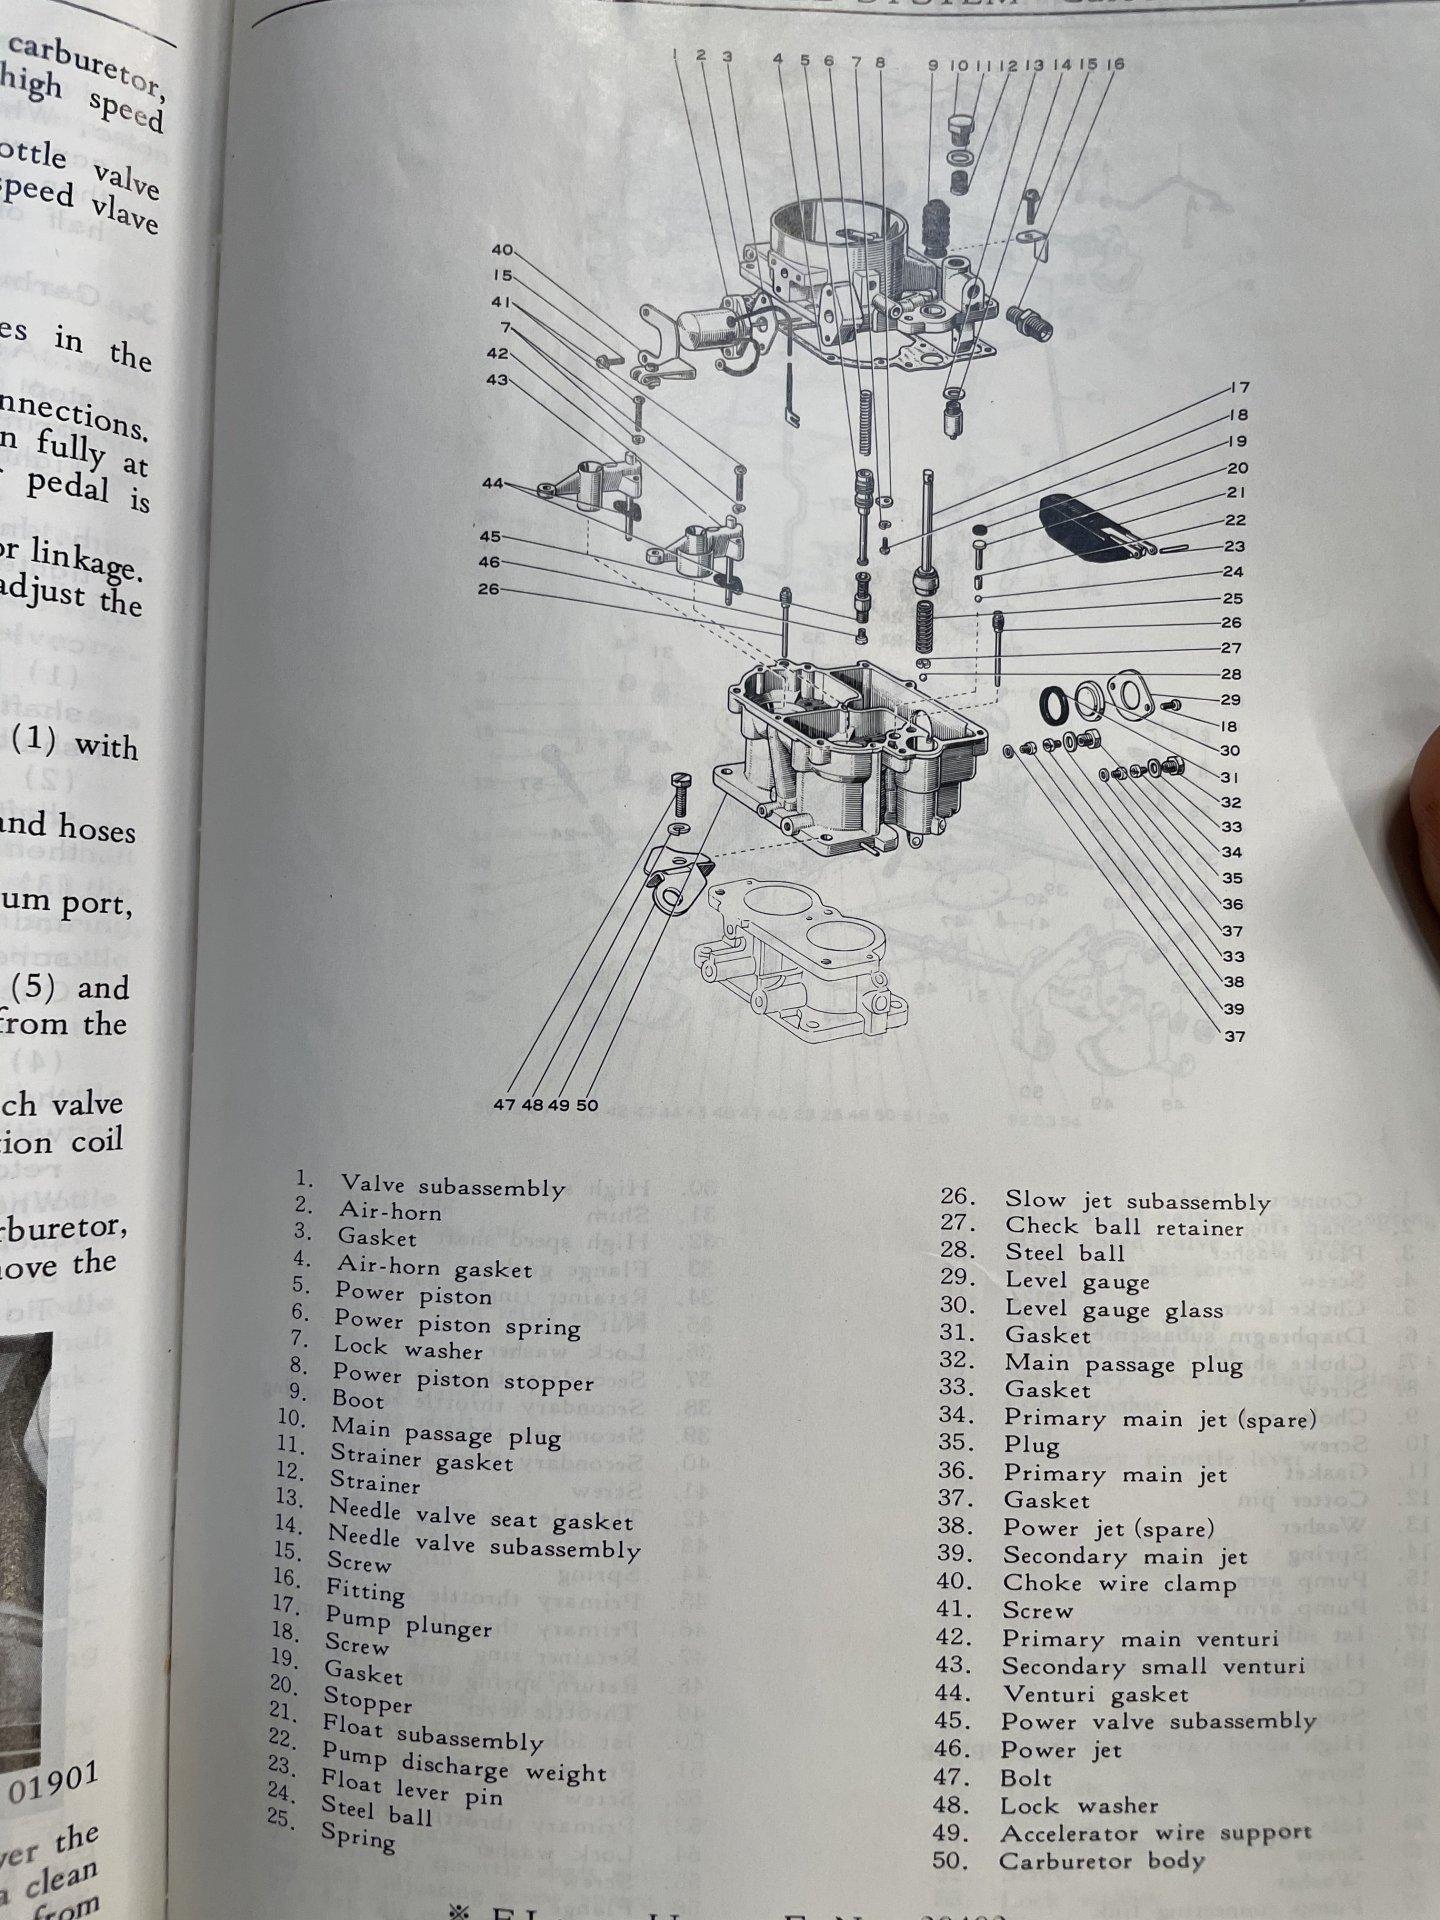 05A11C05-11B9-4D74-B545-AE10B7CF5581.jpeg